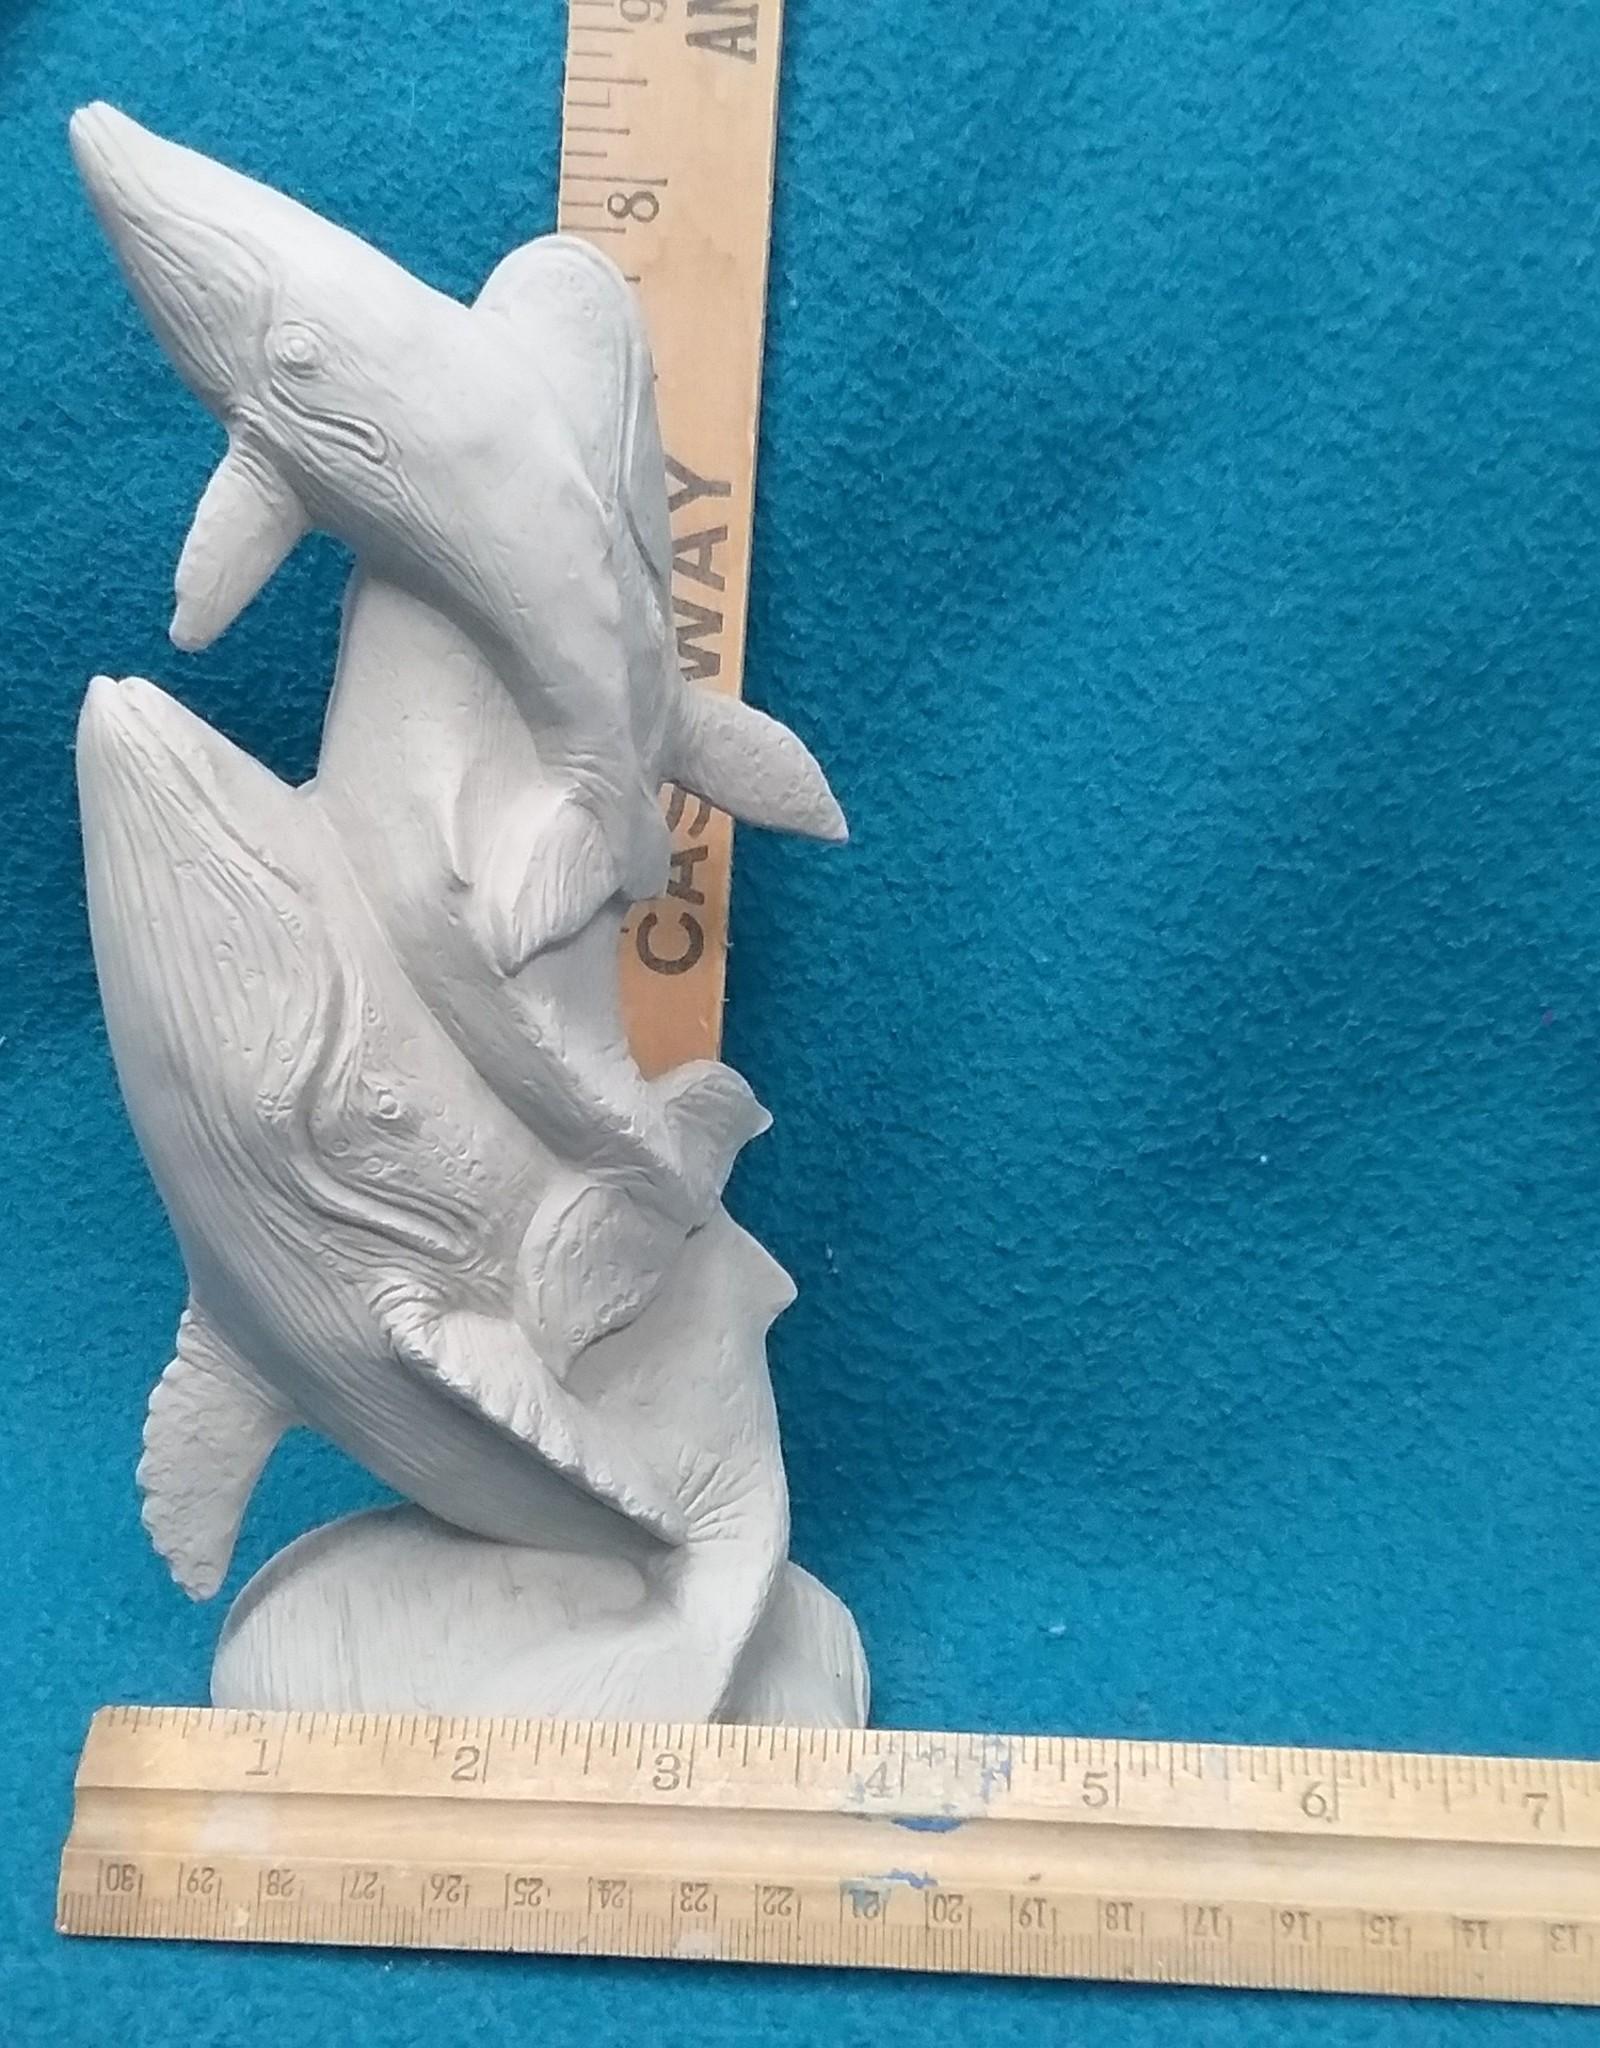 ART KIT Art Kit: Ceramic whale